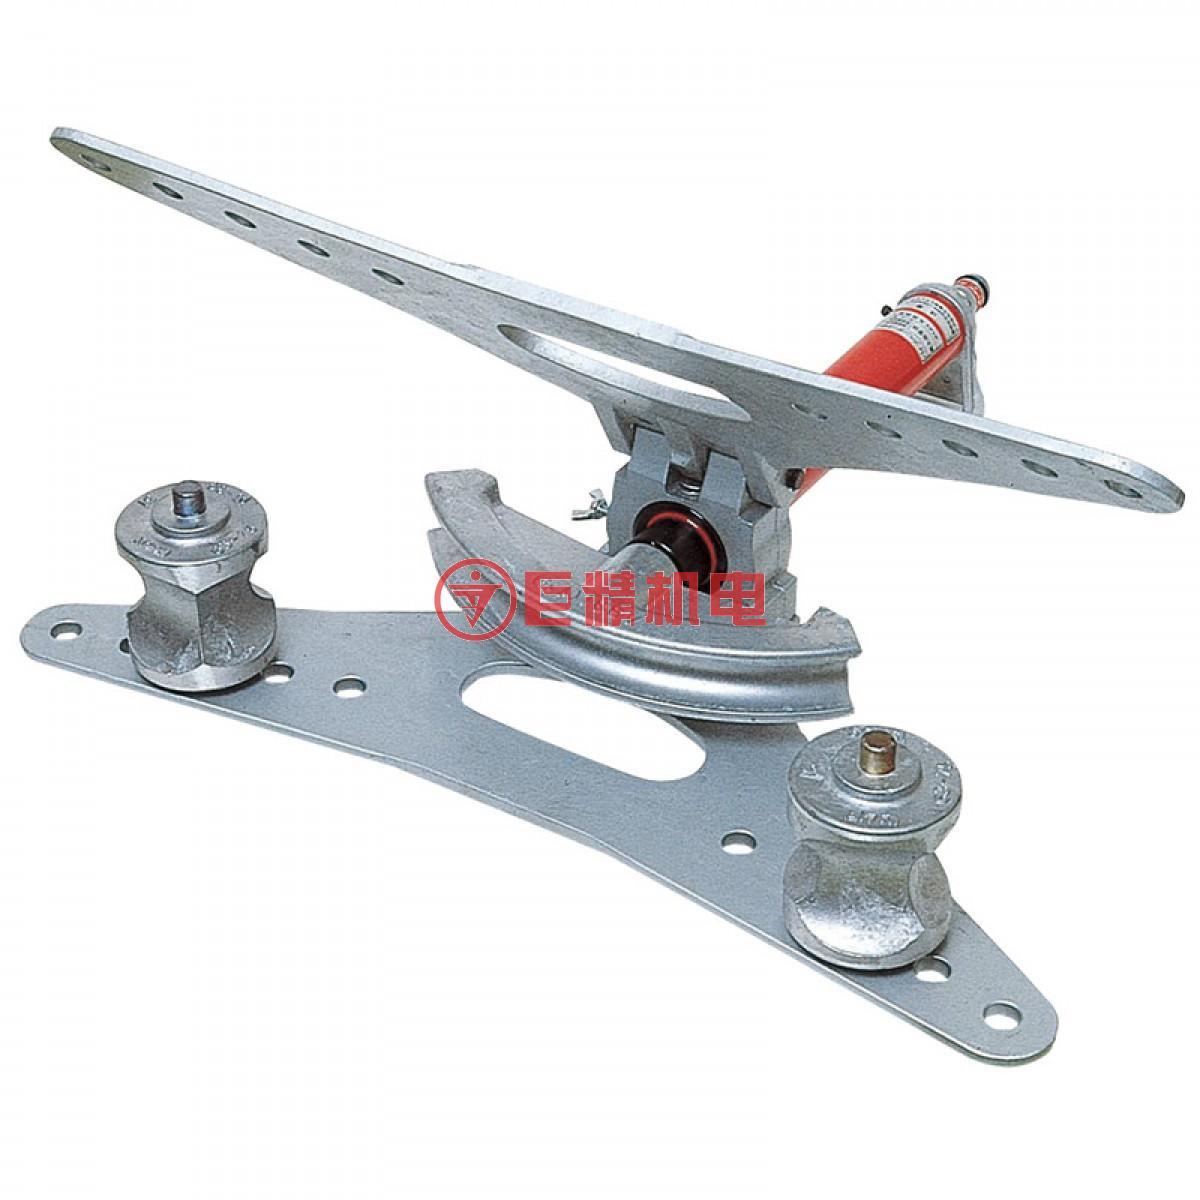 IZUMI PB-10N 折夸各种尺寸和各种厚度的钢管